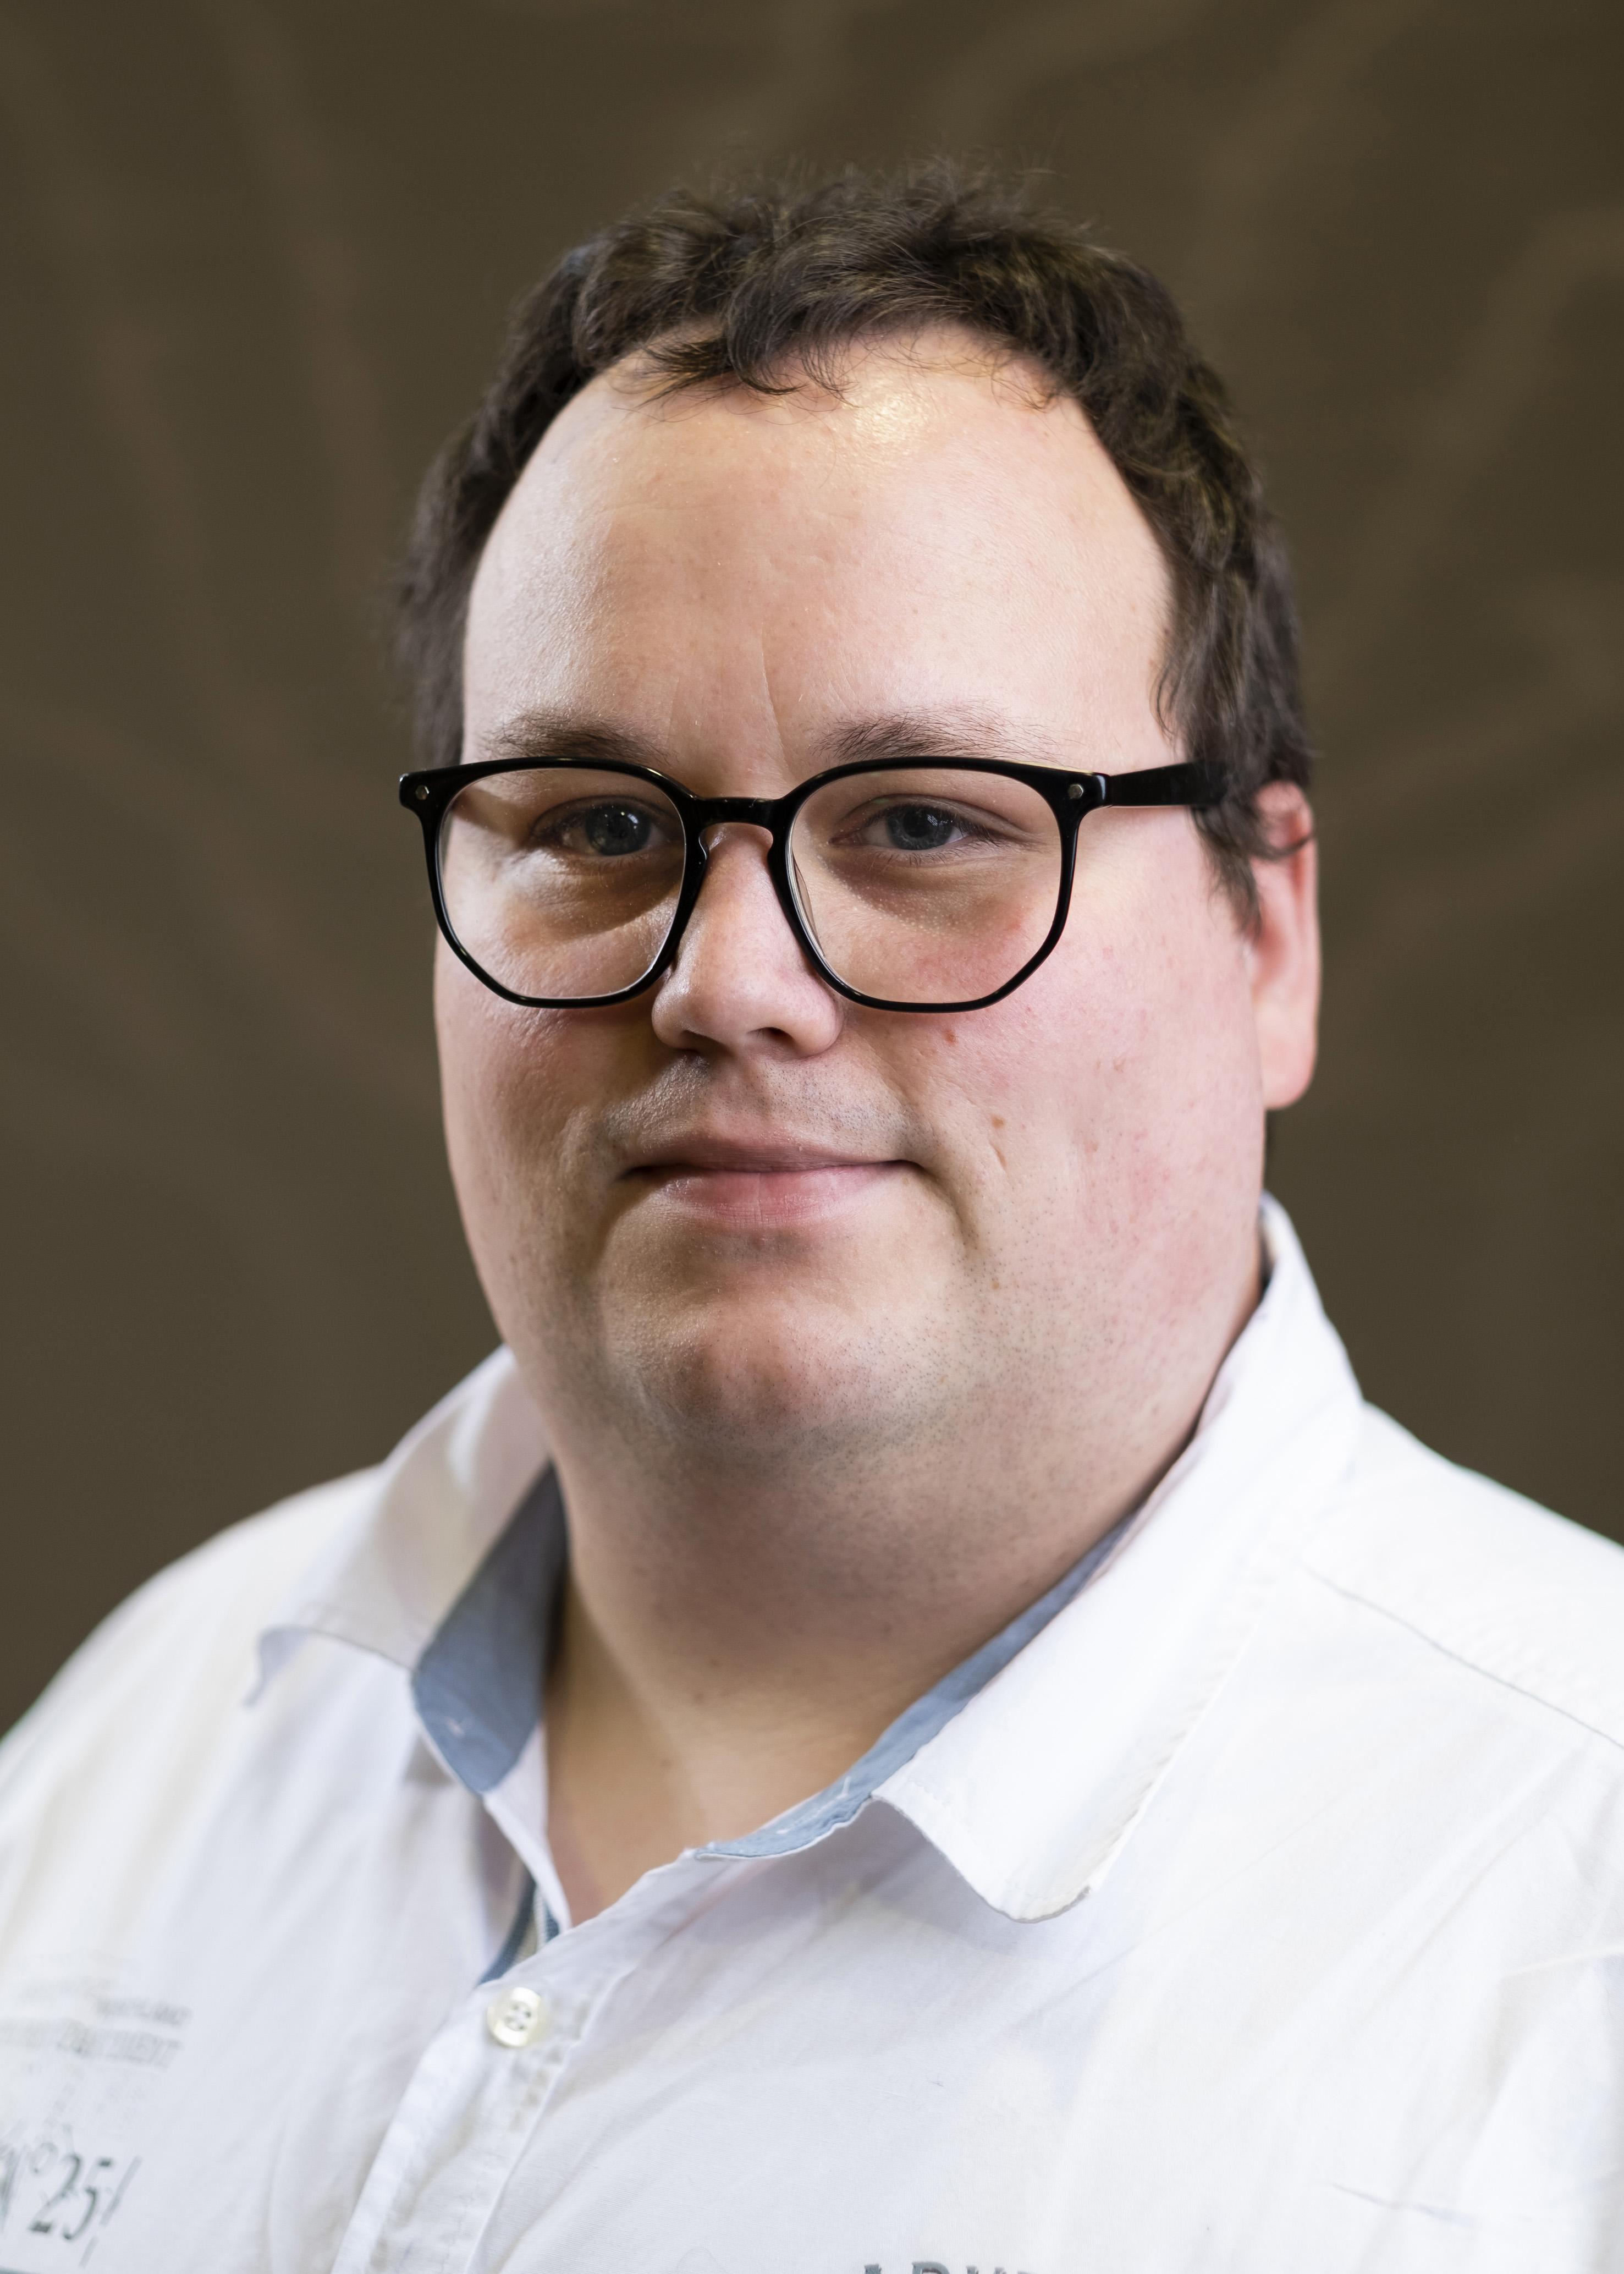 Karl van der Linde